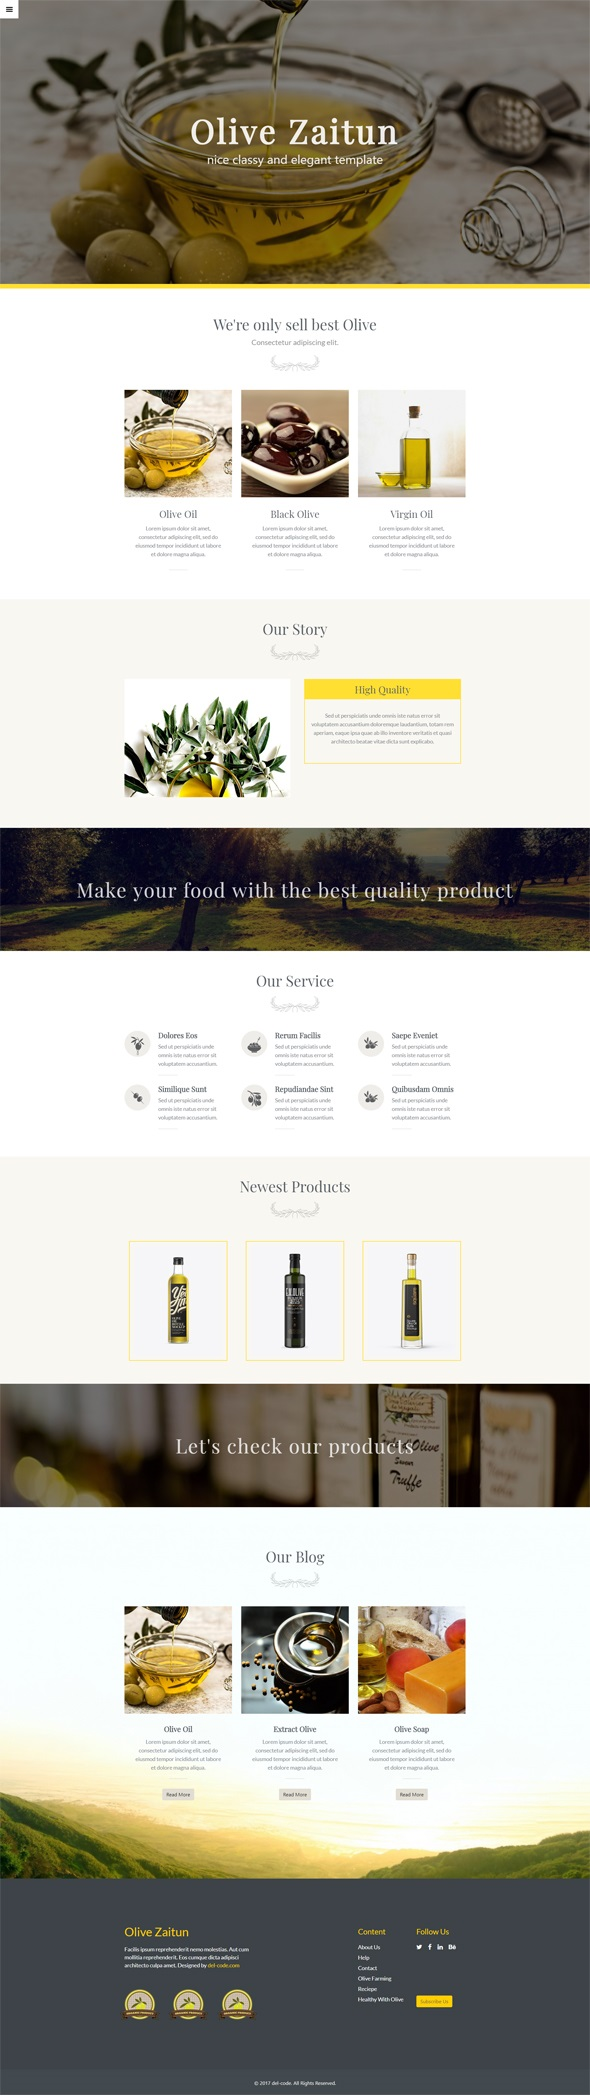 Olive Zaitun - 3